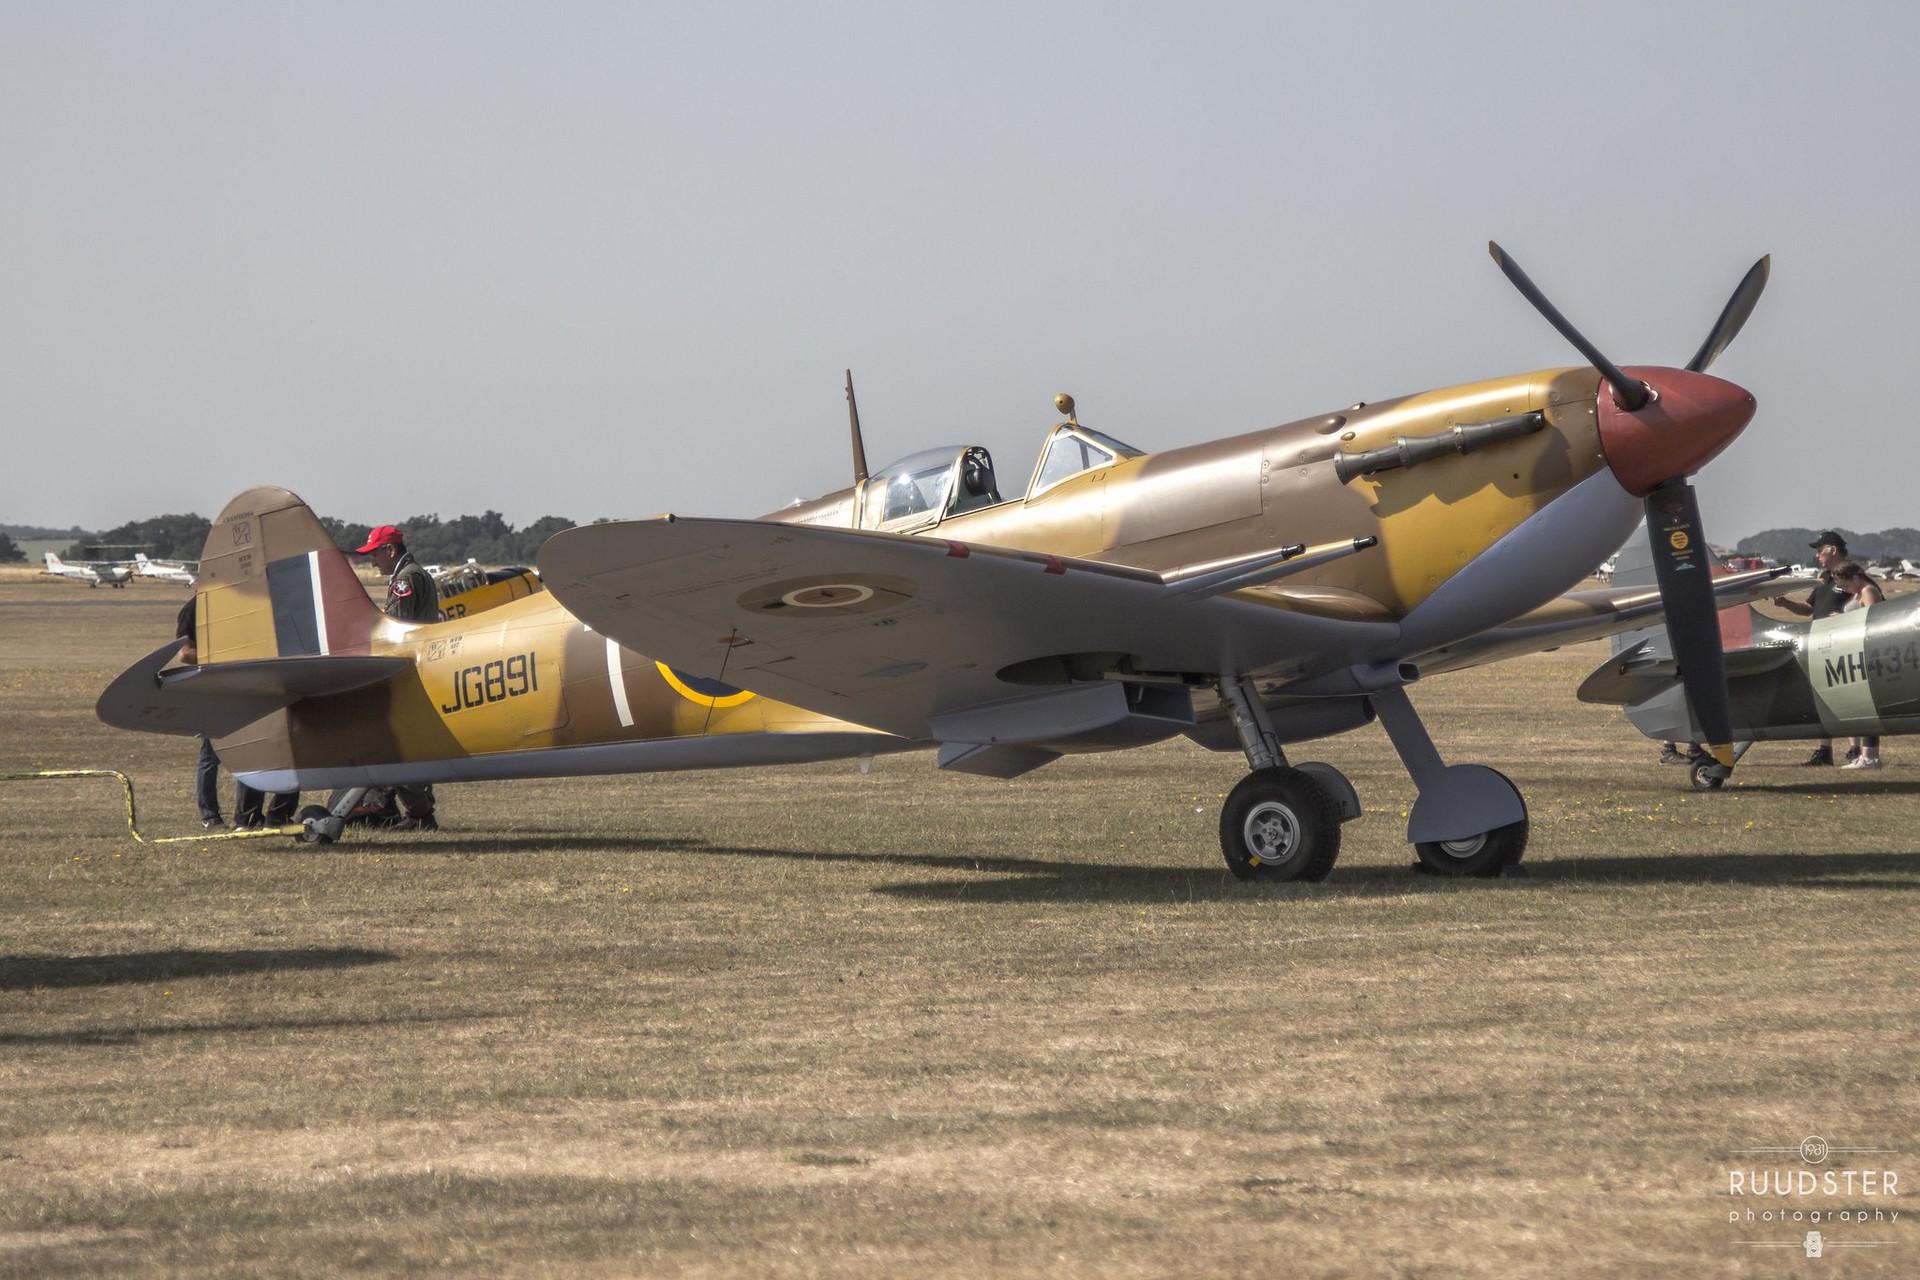 JG891 / G-LFVC   Build: 1942 - Supermarine Spitfire Mk.Vc